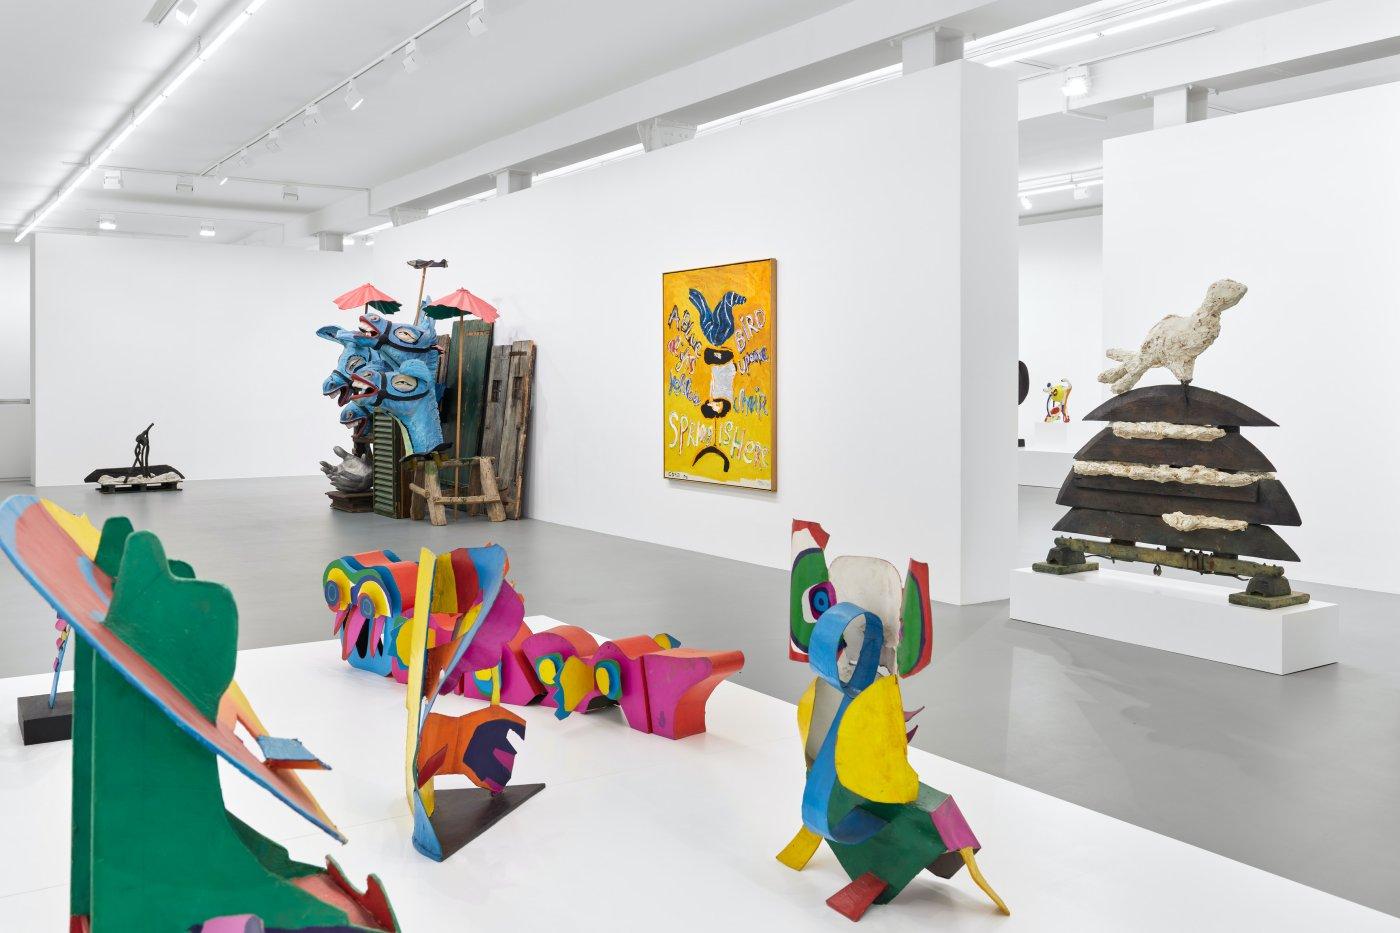 Galerie Max Hetzler Goethestrasse Karel Appel 2